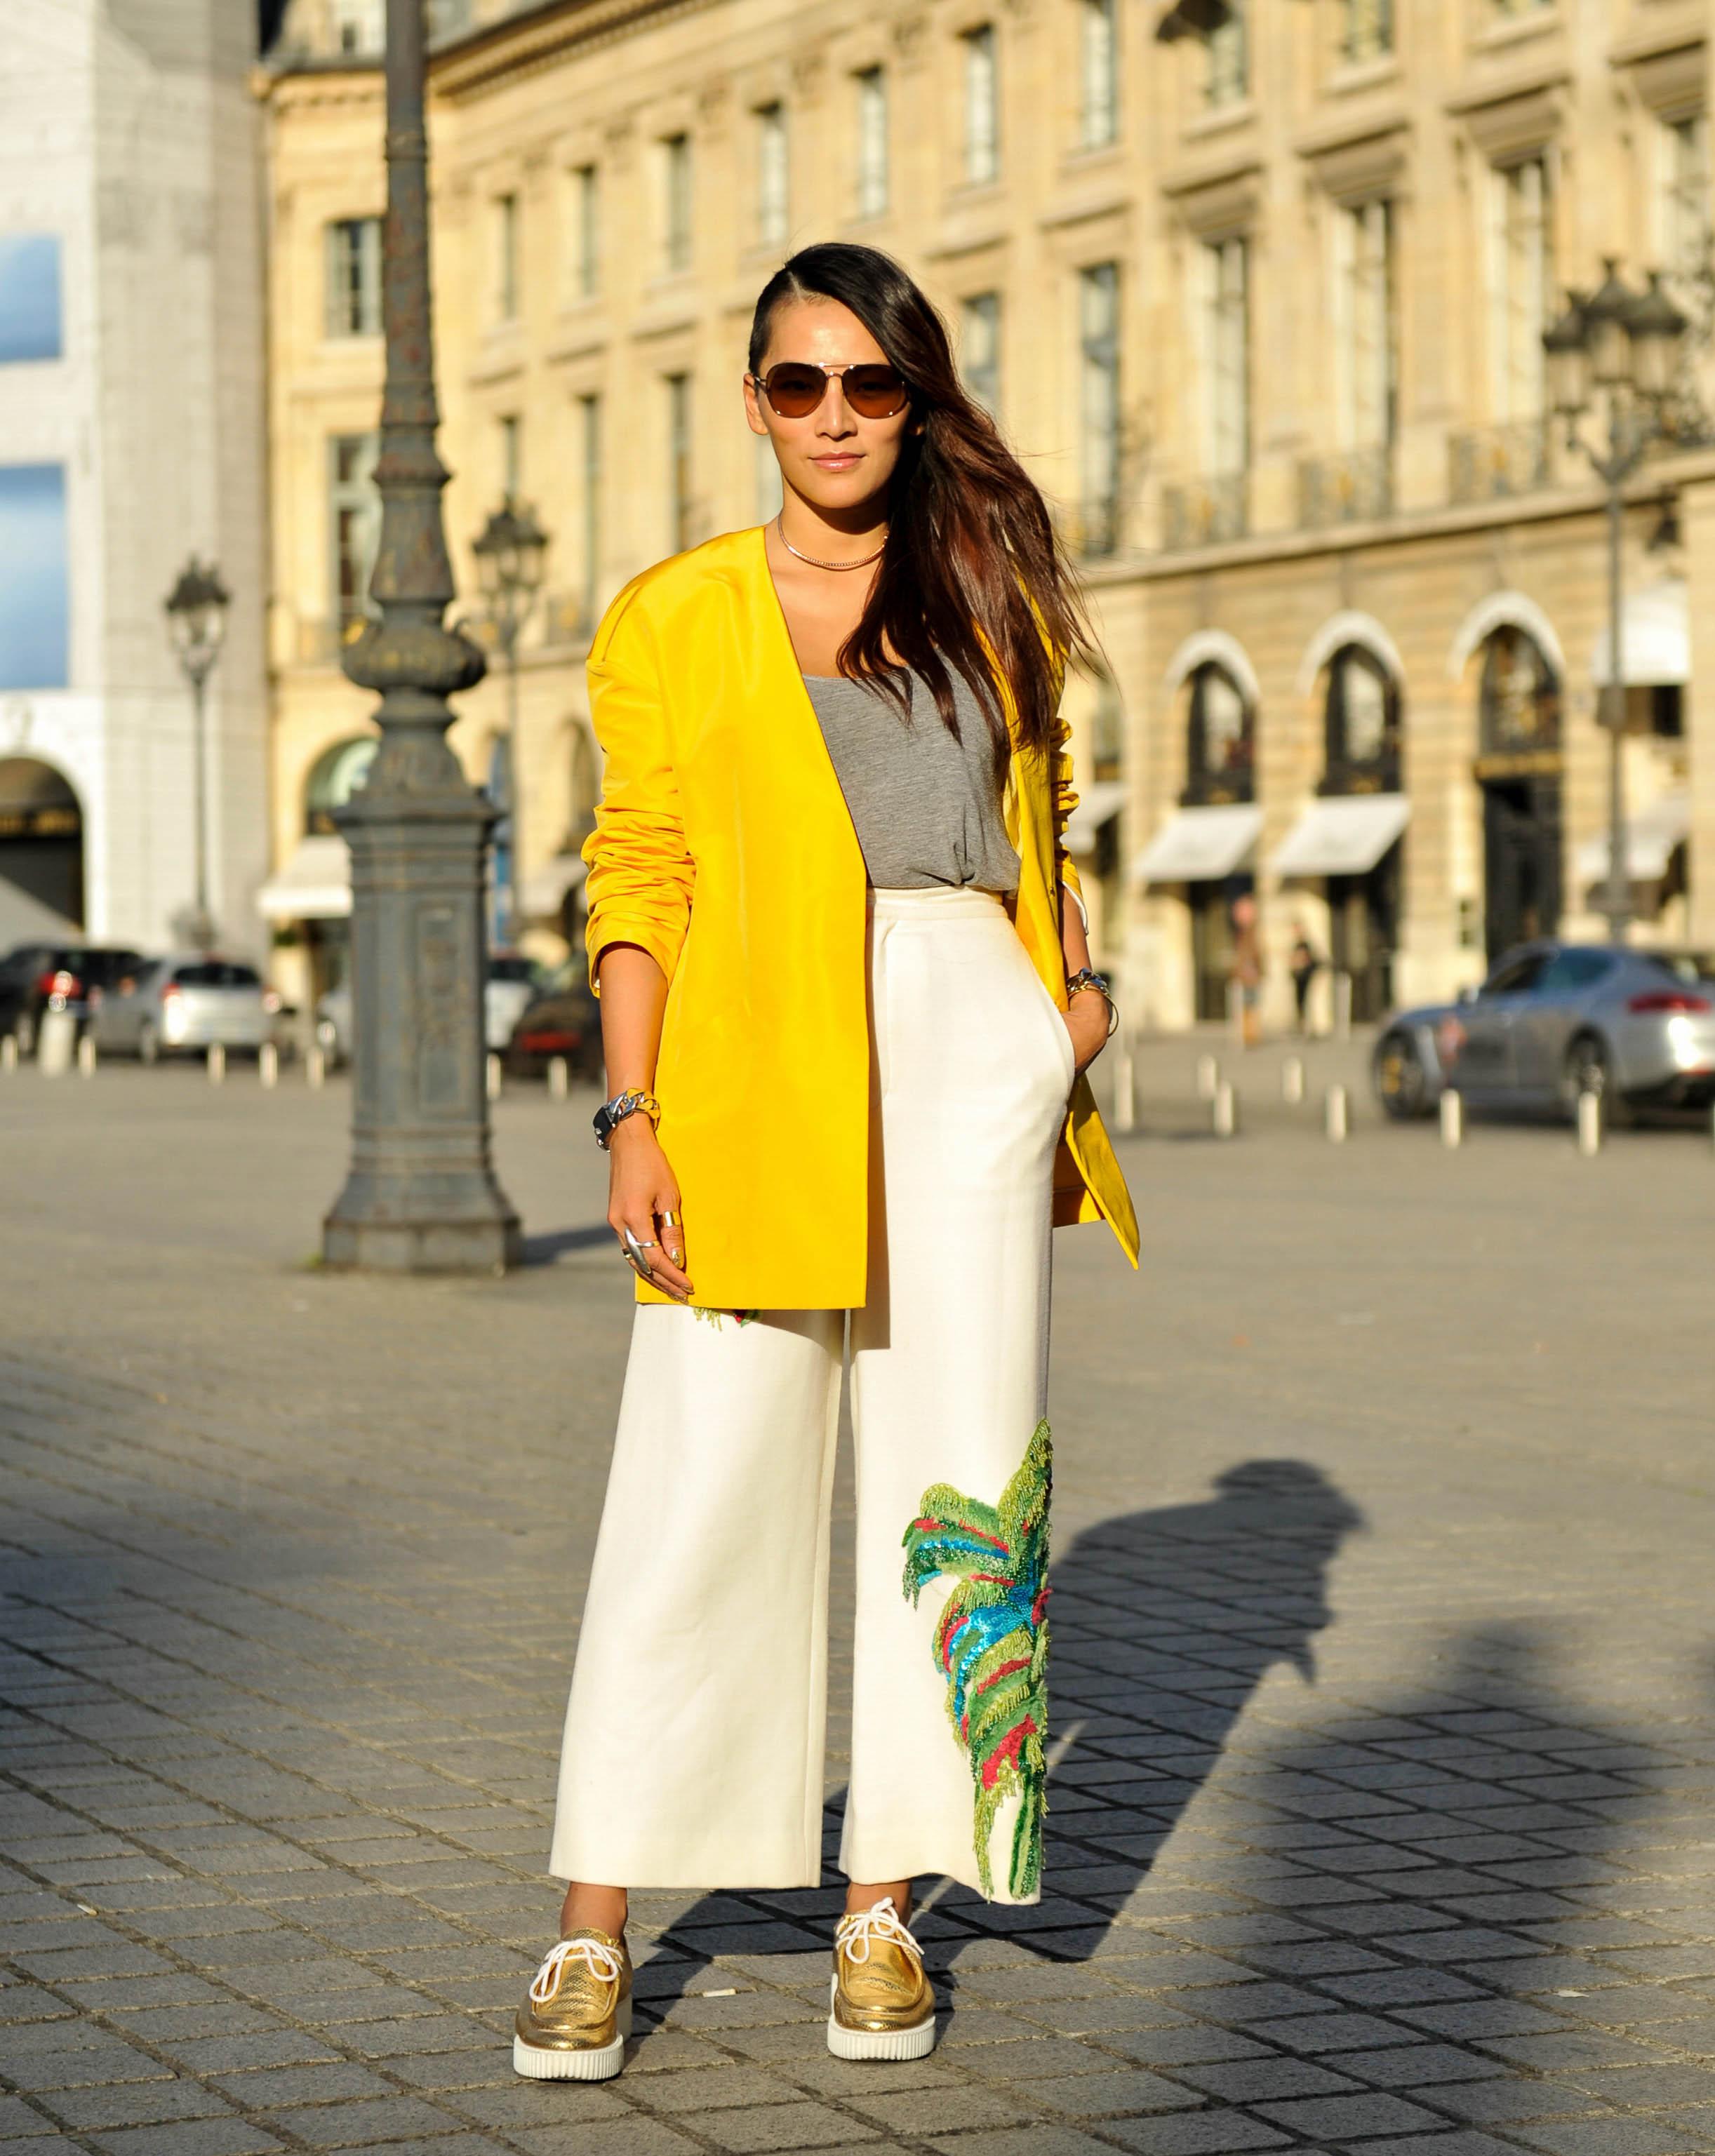 StreetStyle_ParisFashionWeek_LeandroJusten_124.jpg